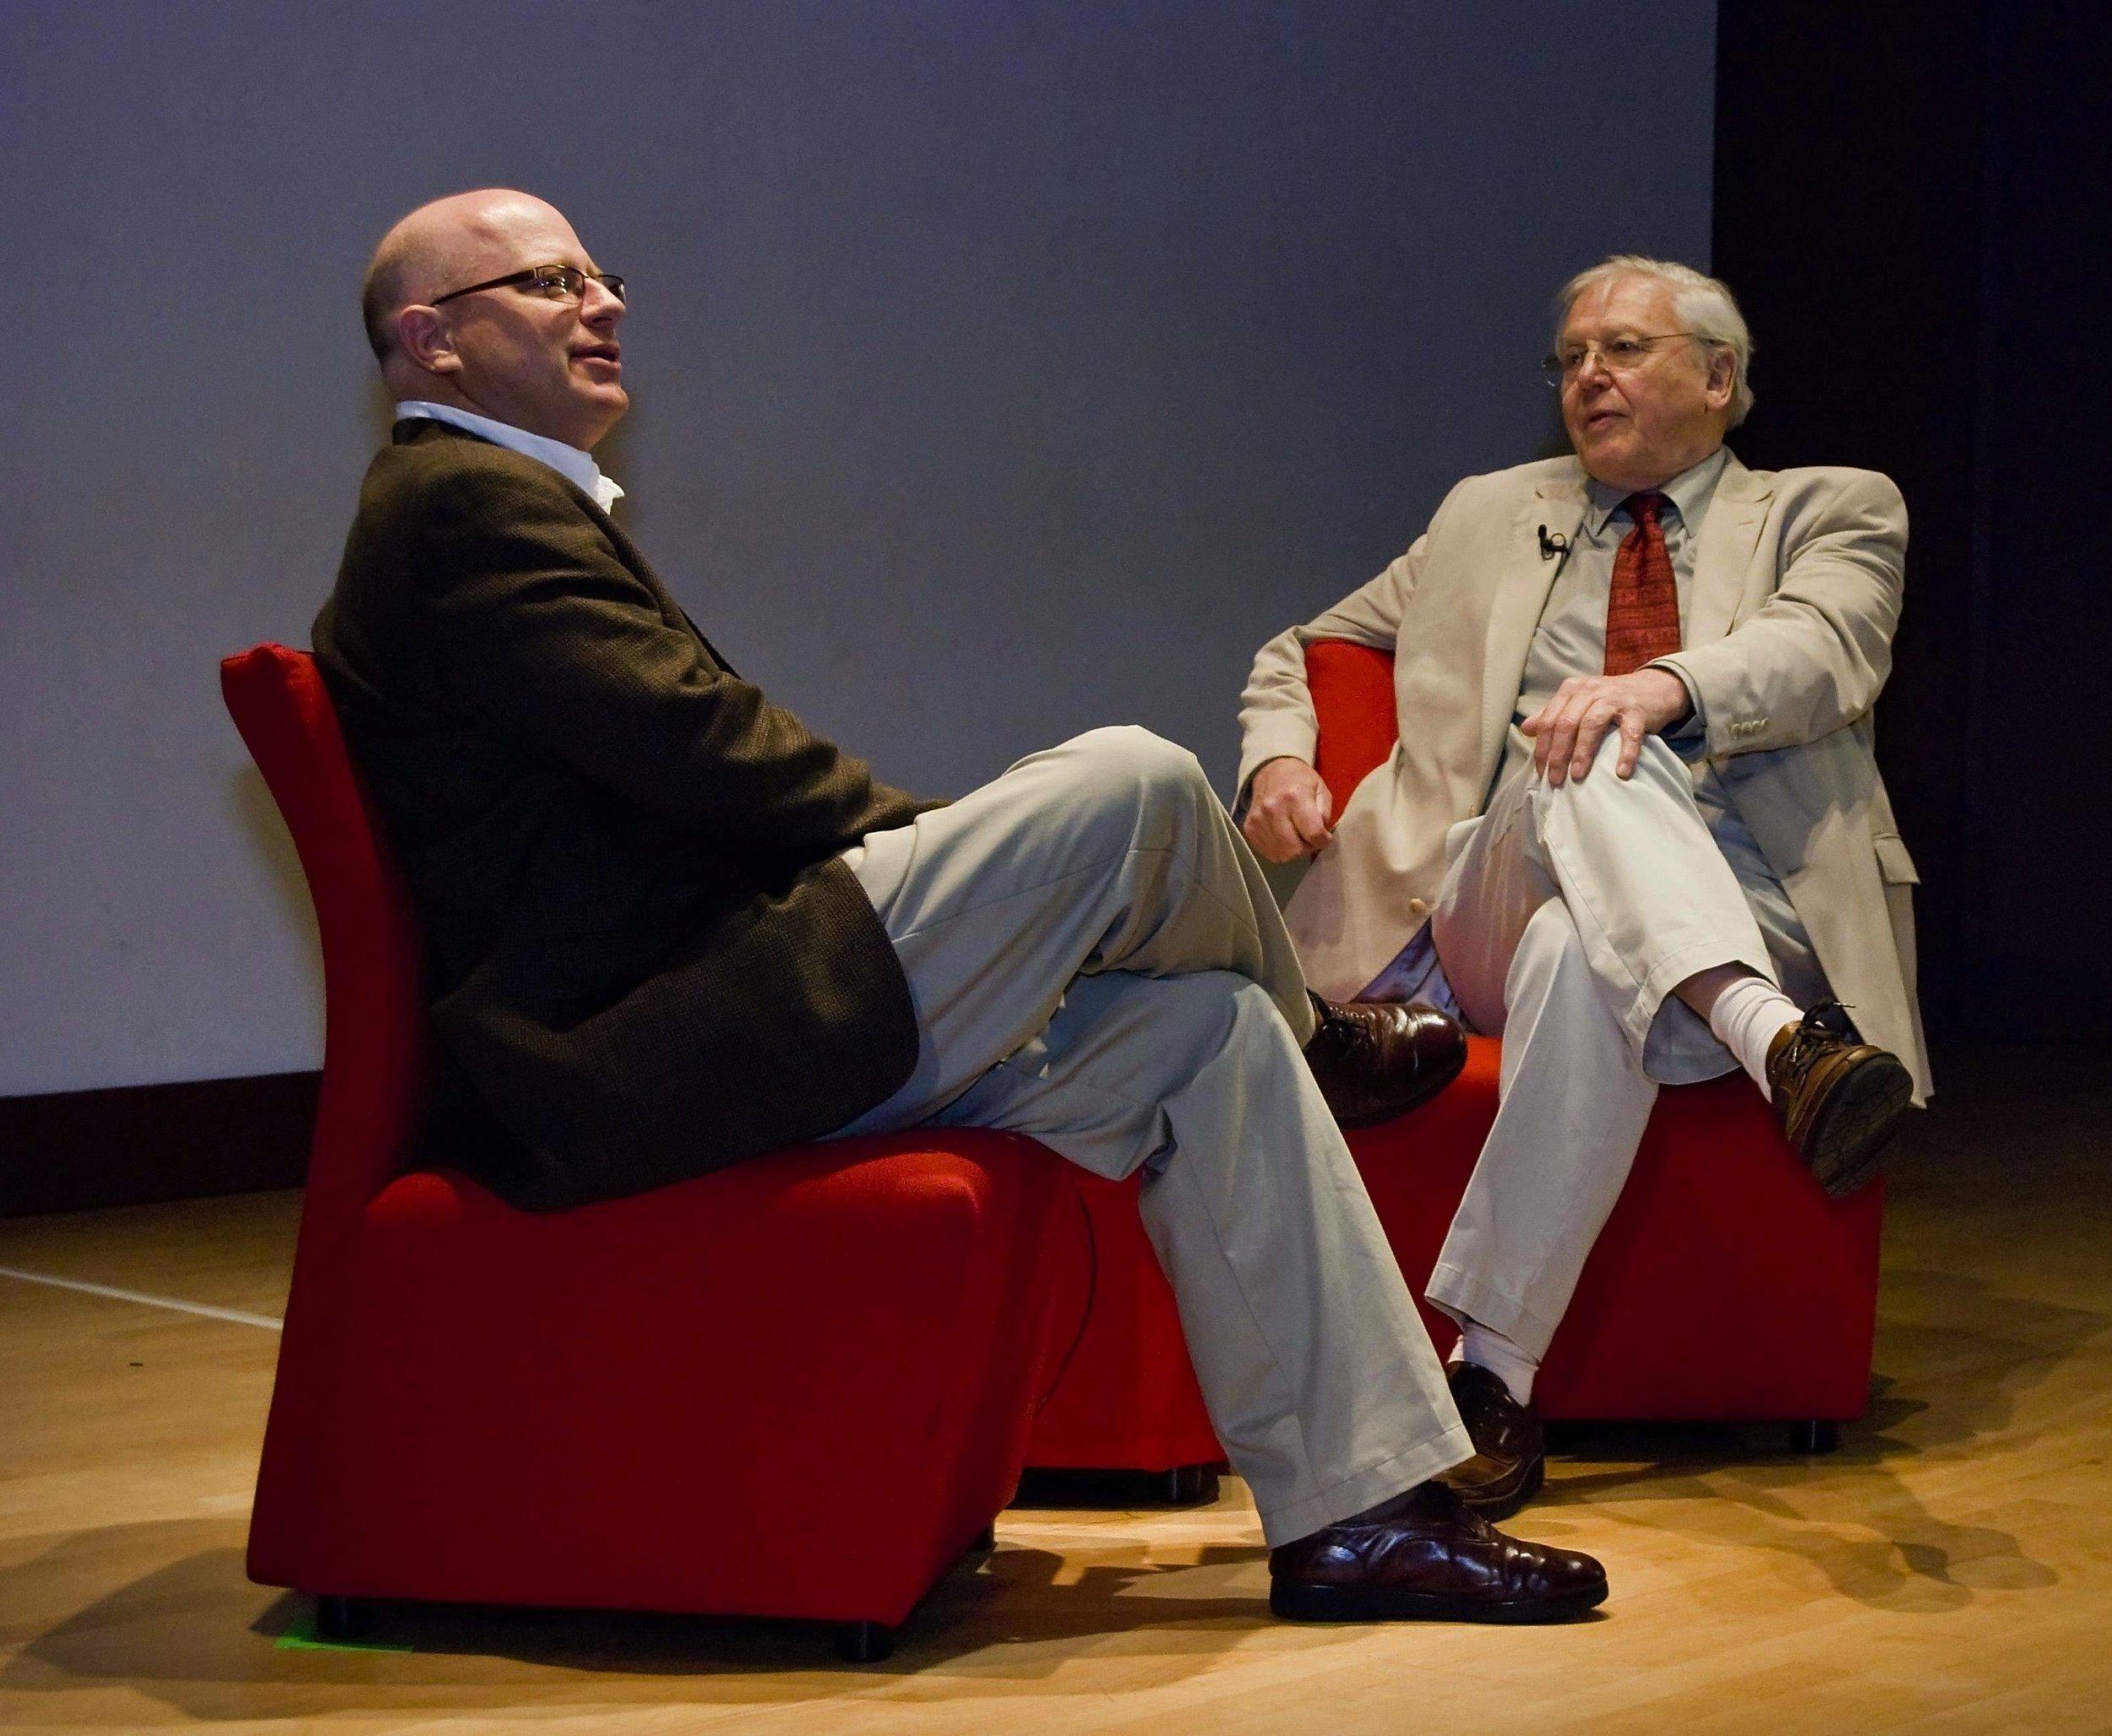 Alan Marcus and David Attenborough.jpg